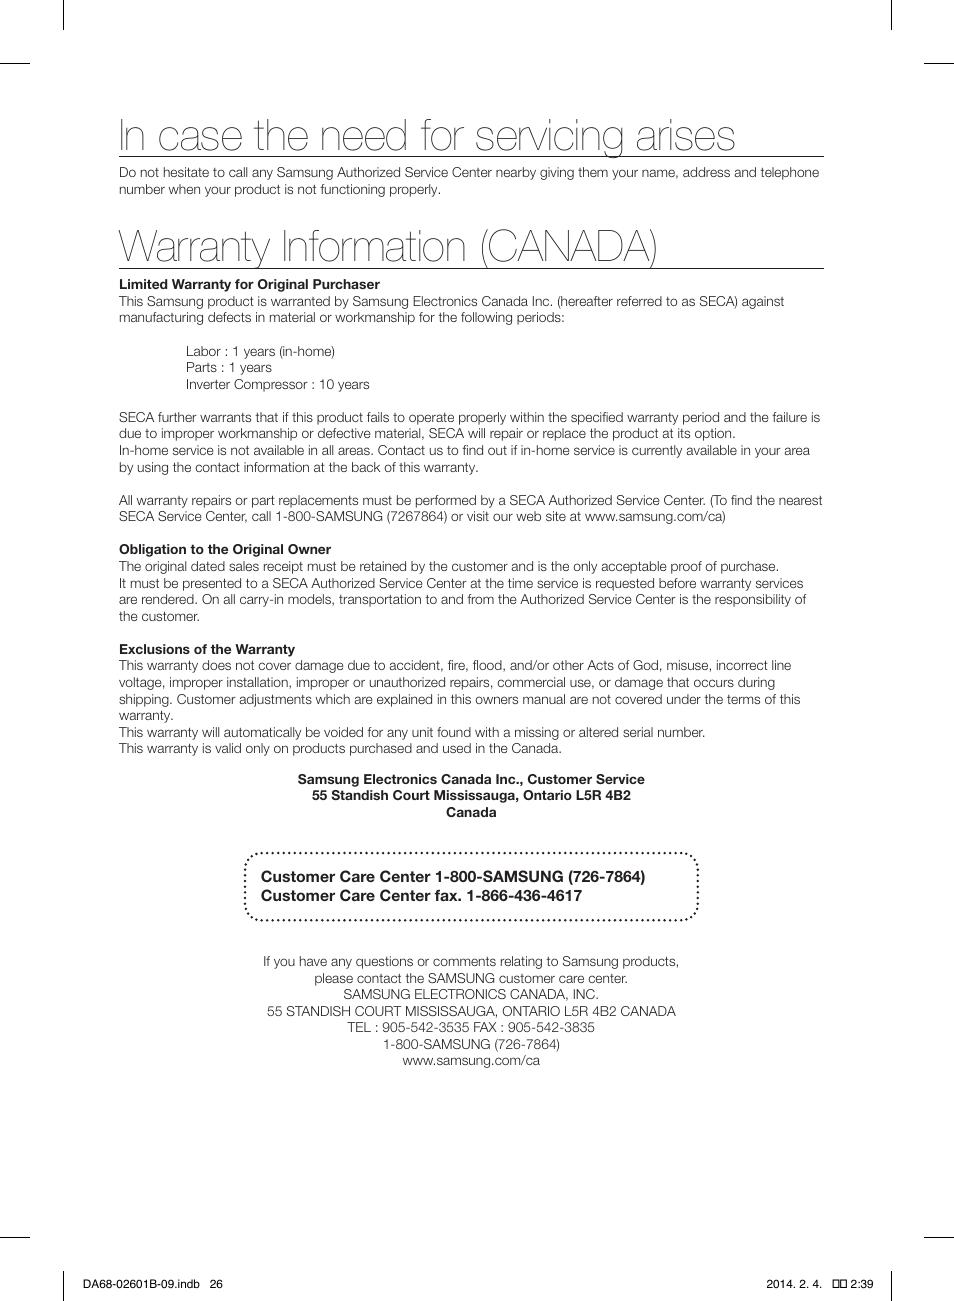 Warranty information canada samsung rf261biaesr aa user manual warranty information canada samsung rf261biaesr aa user manual page 26 publicscrutiny Image collections